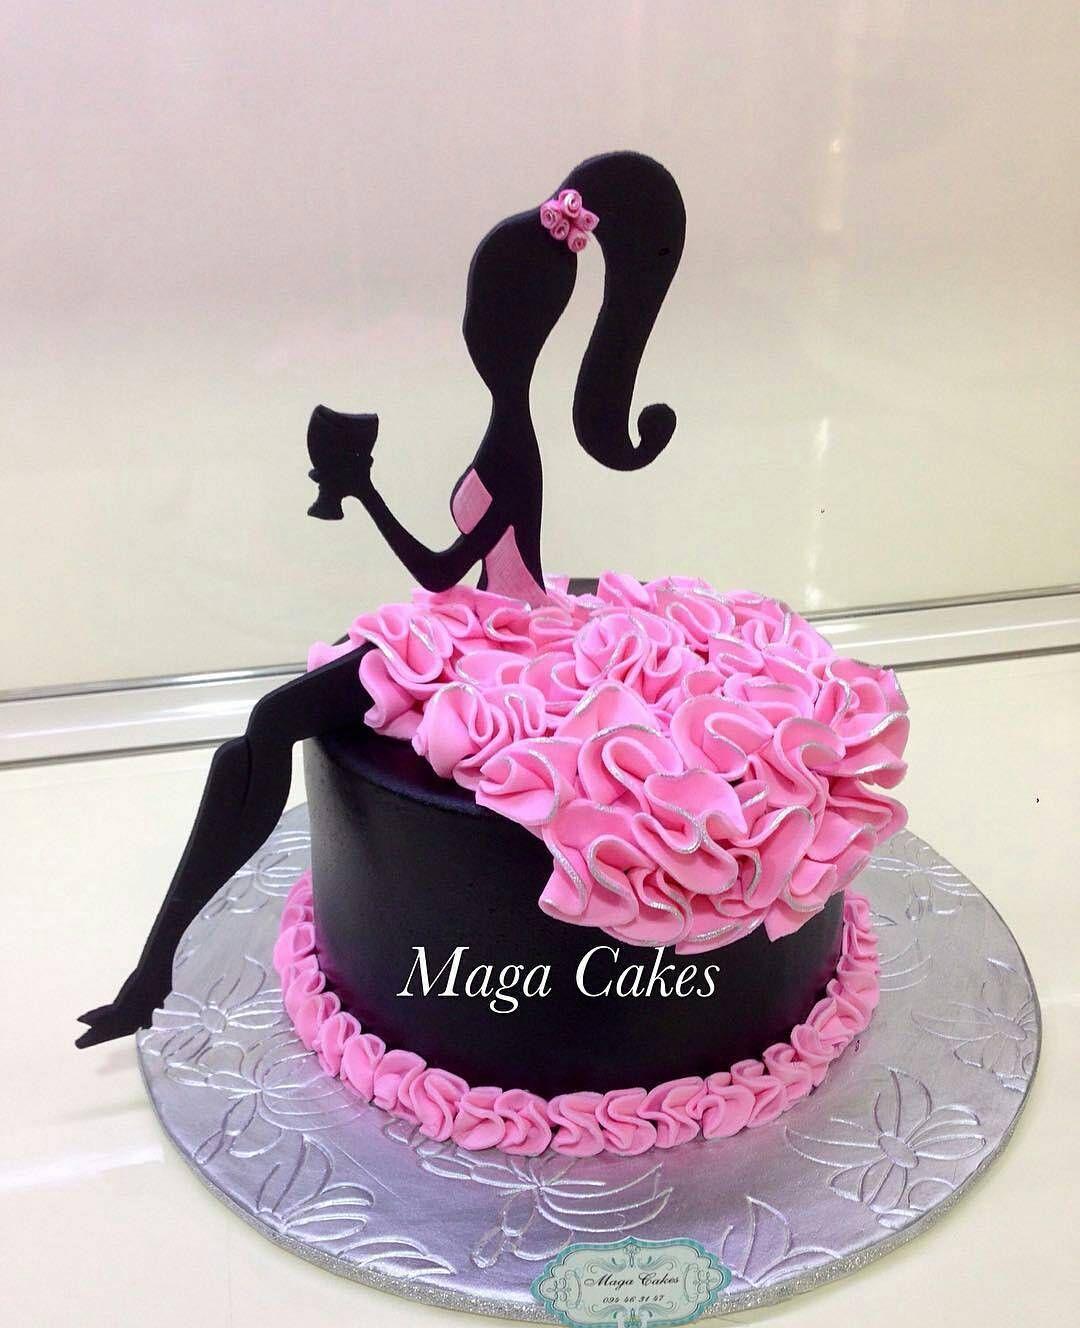 PRETTY Girly Girl Cake via @maga_cakes ️ ️ ️#Cakebakeoffng ...